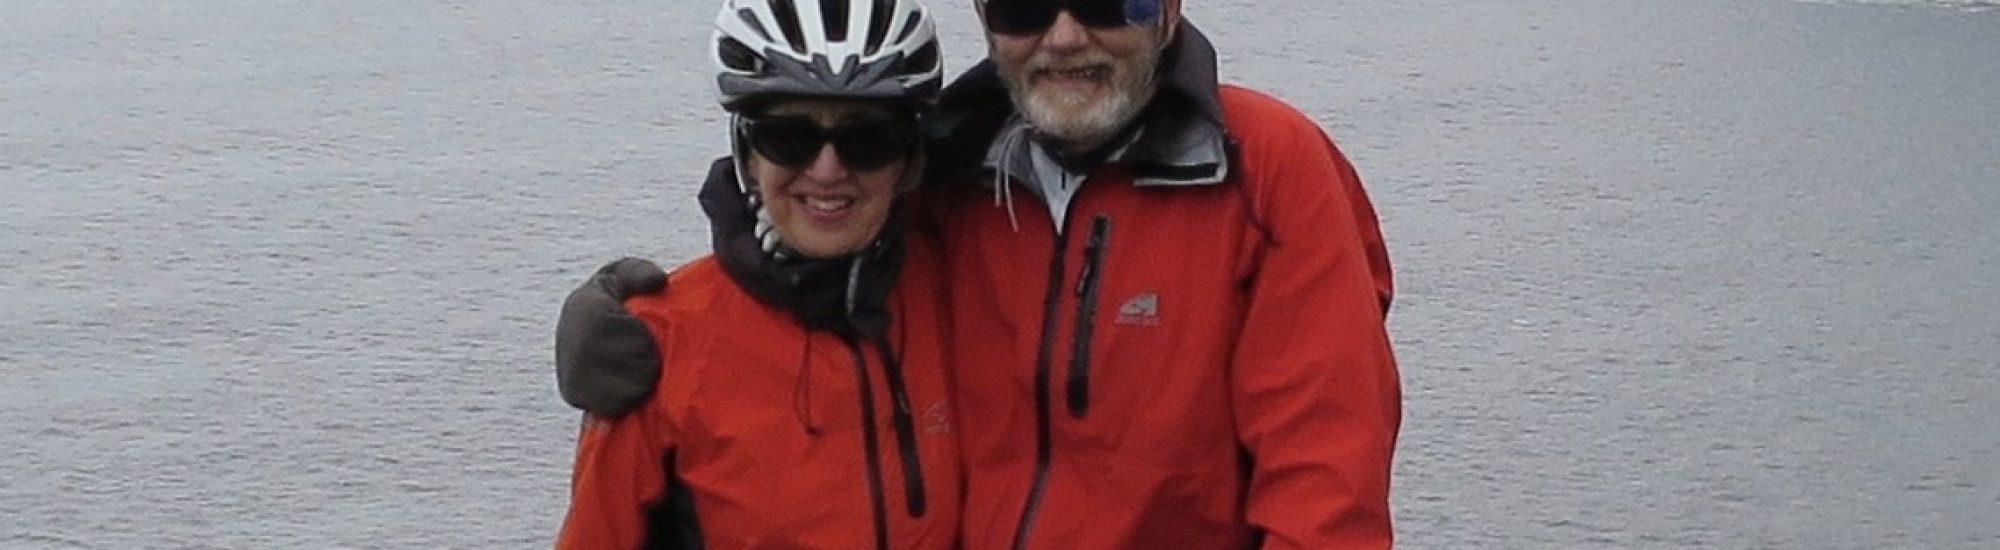 Art and Julane's Bike Tour of Donegal Ireland